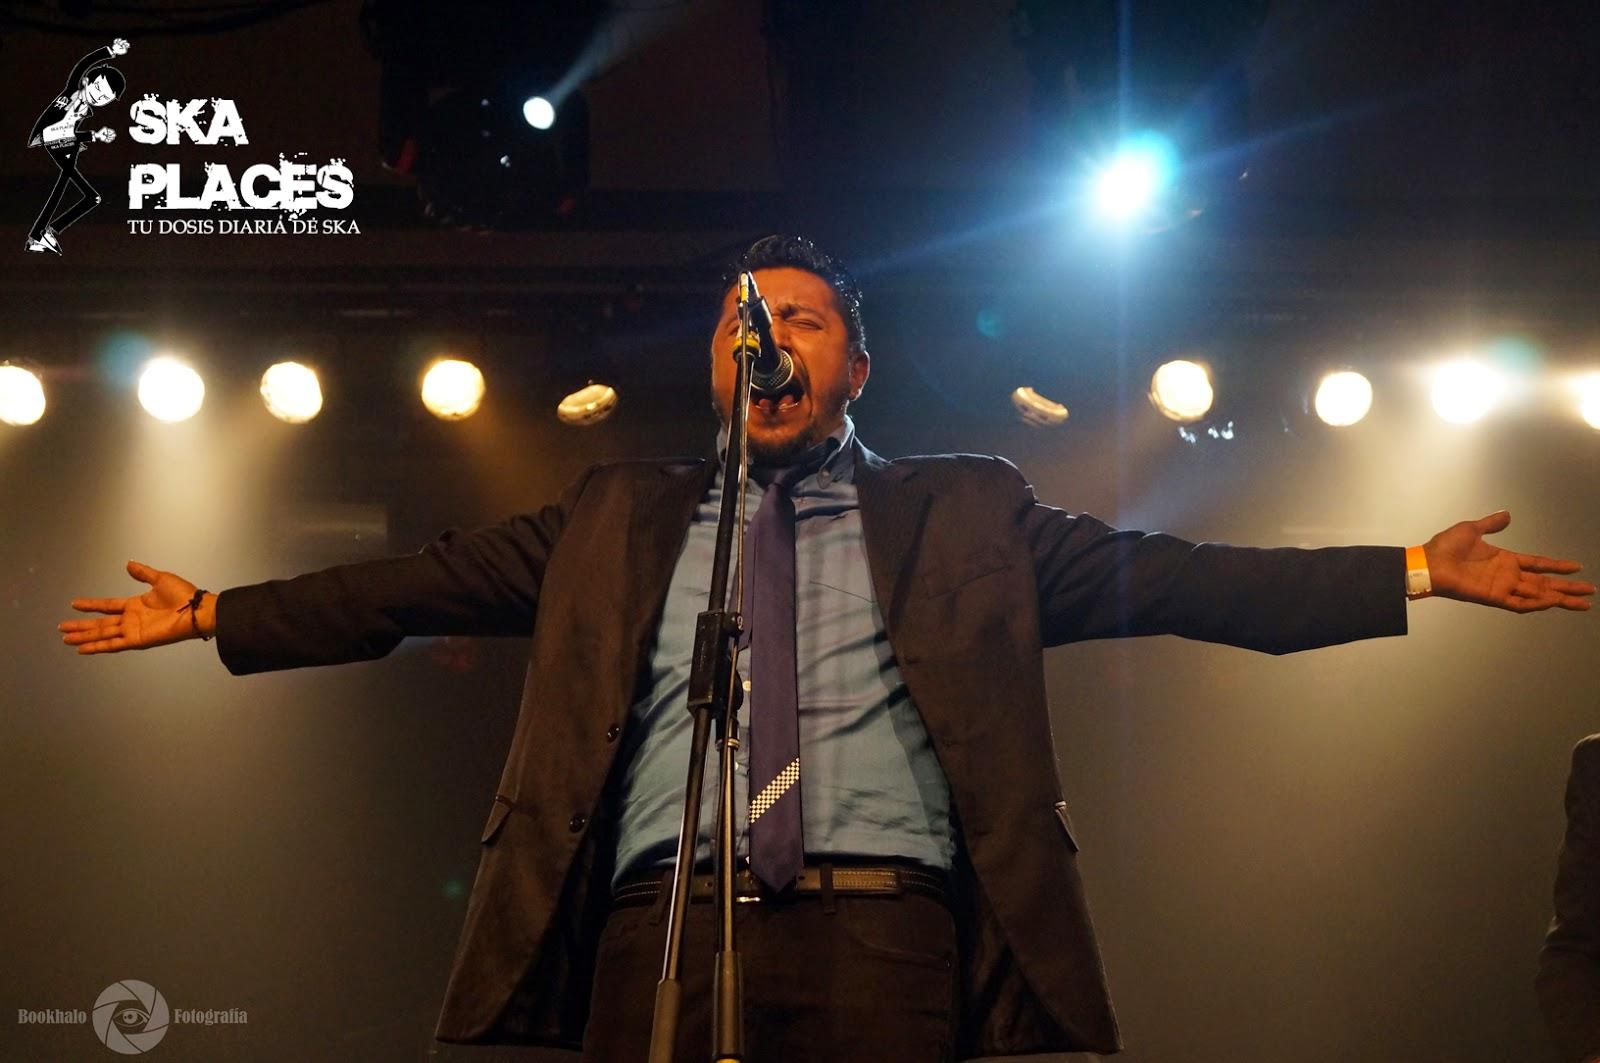 maskatesta aniversario - israel vocalista